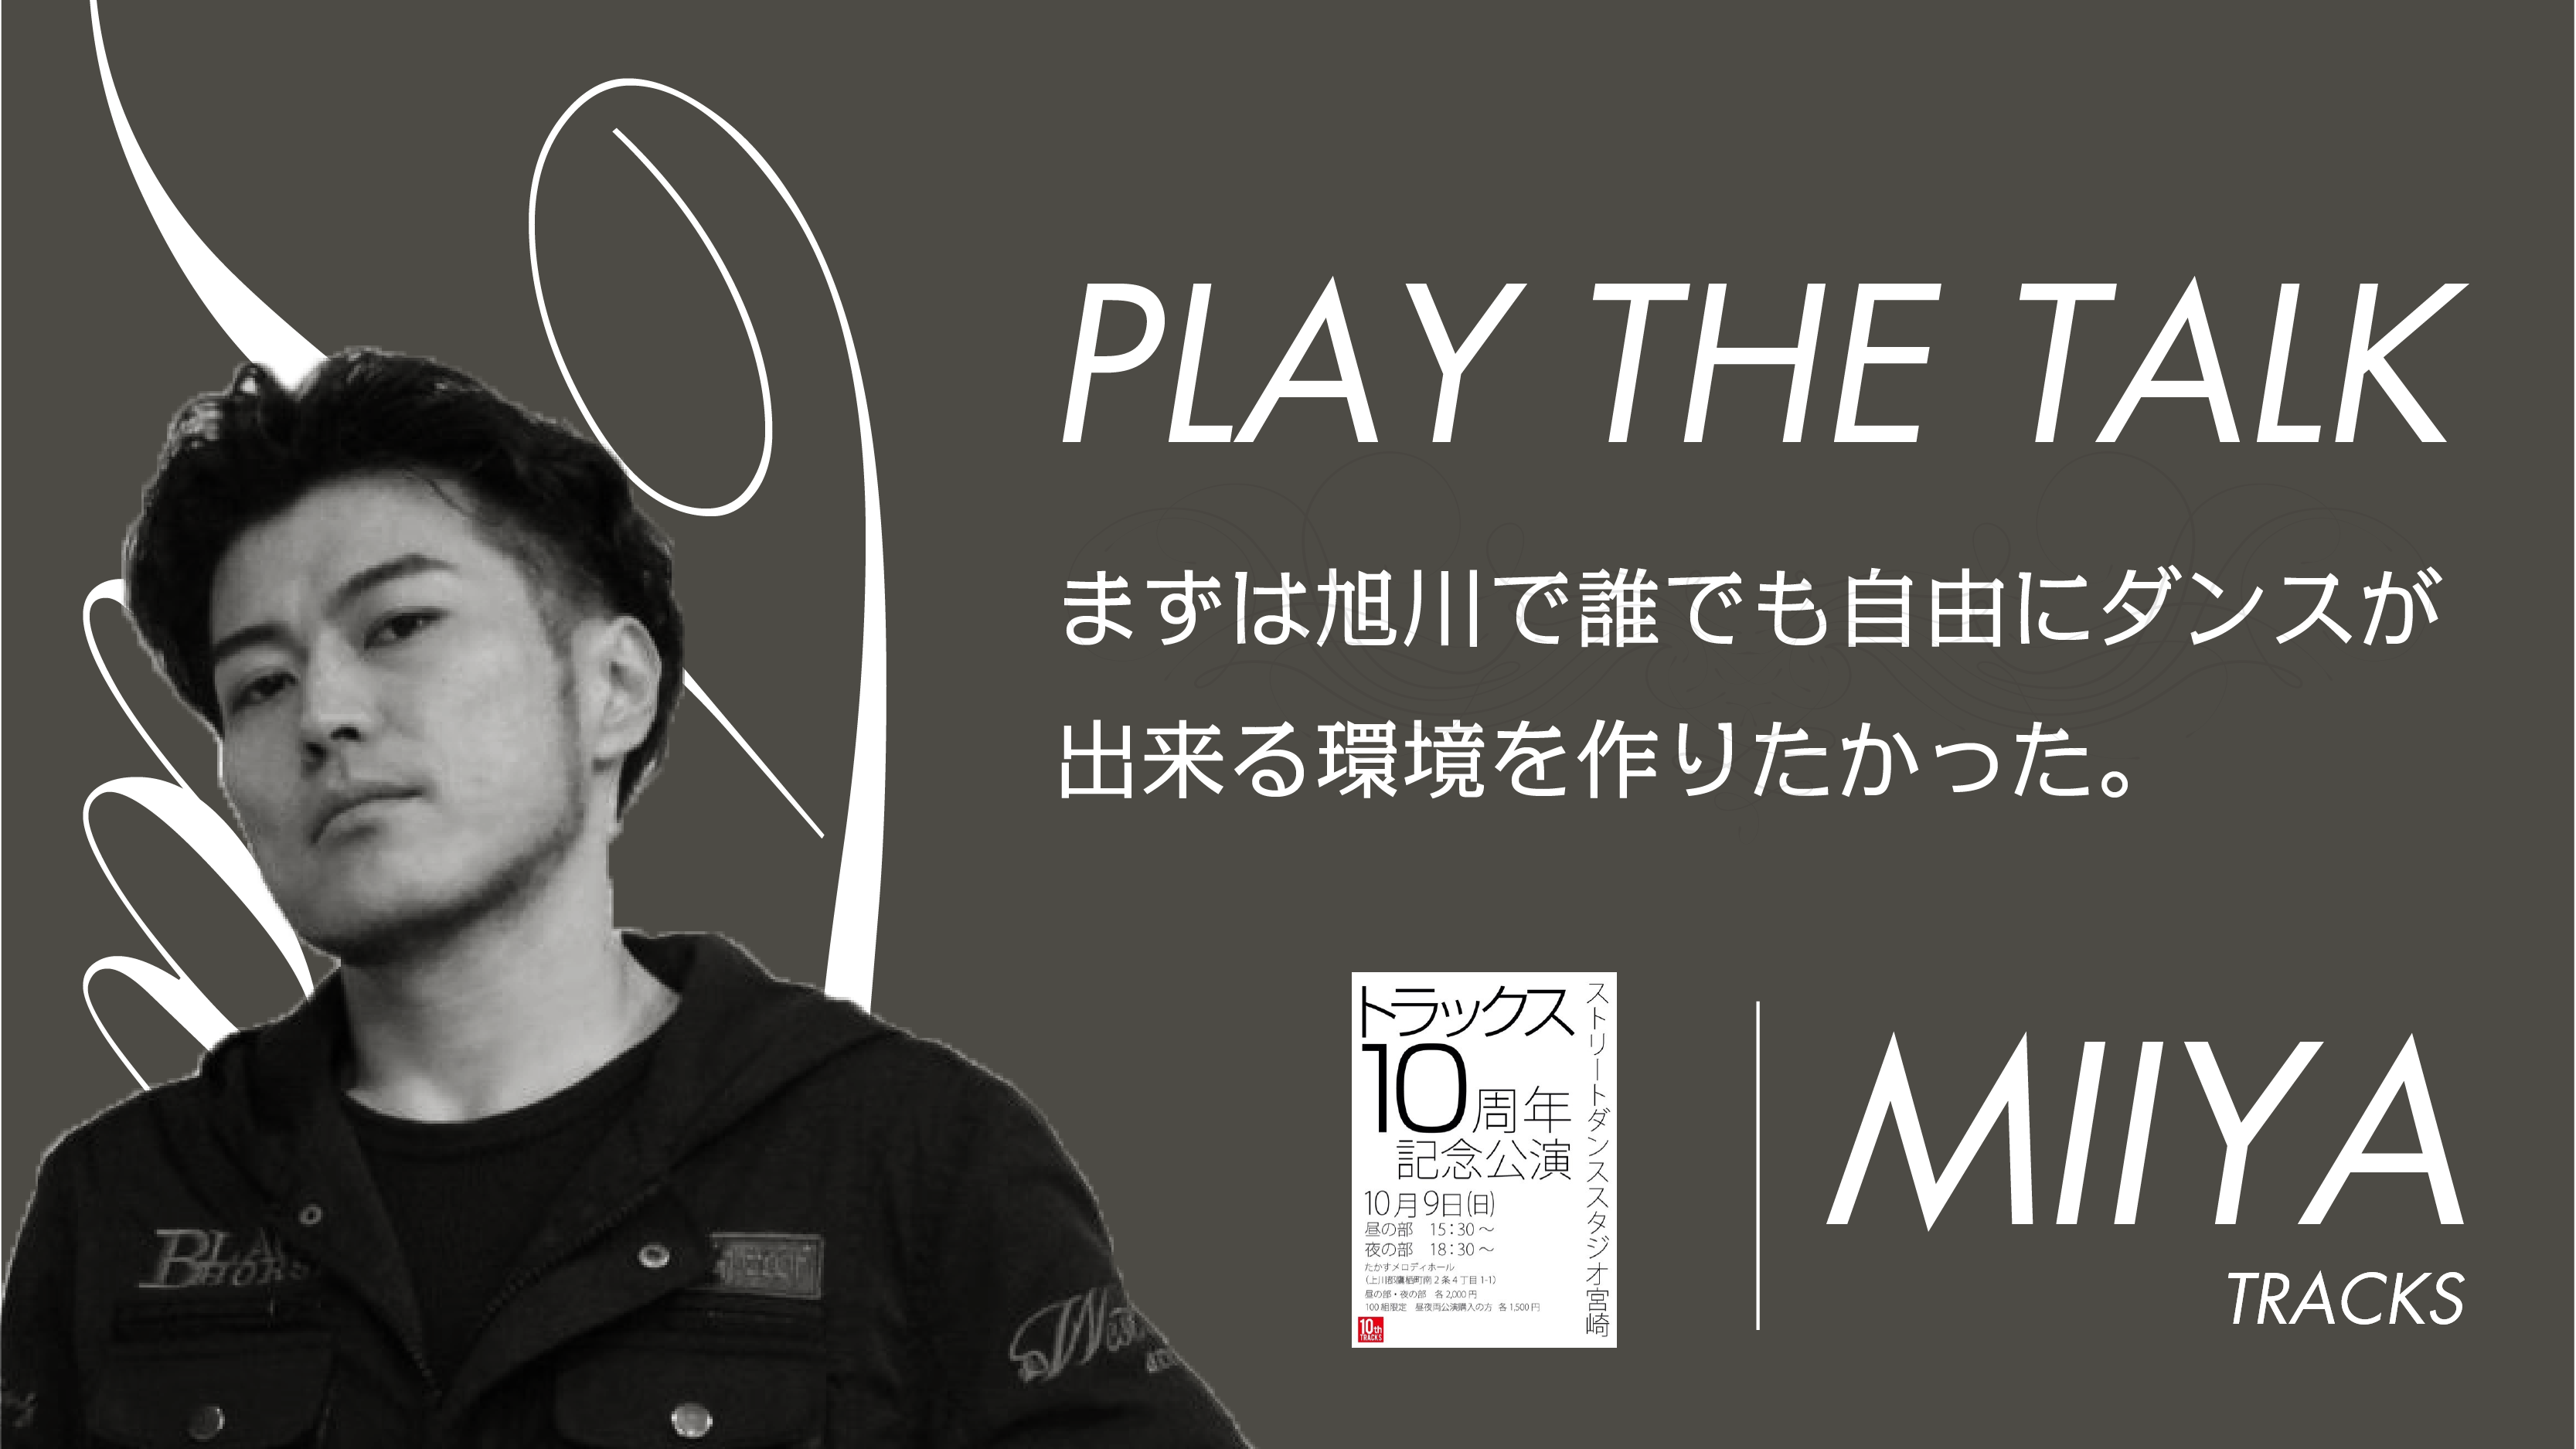 PLAY THE TALK 〜トラックス10周年記念公演×MIYA〜